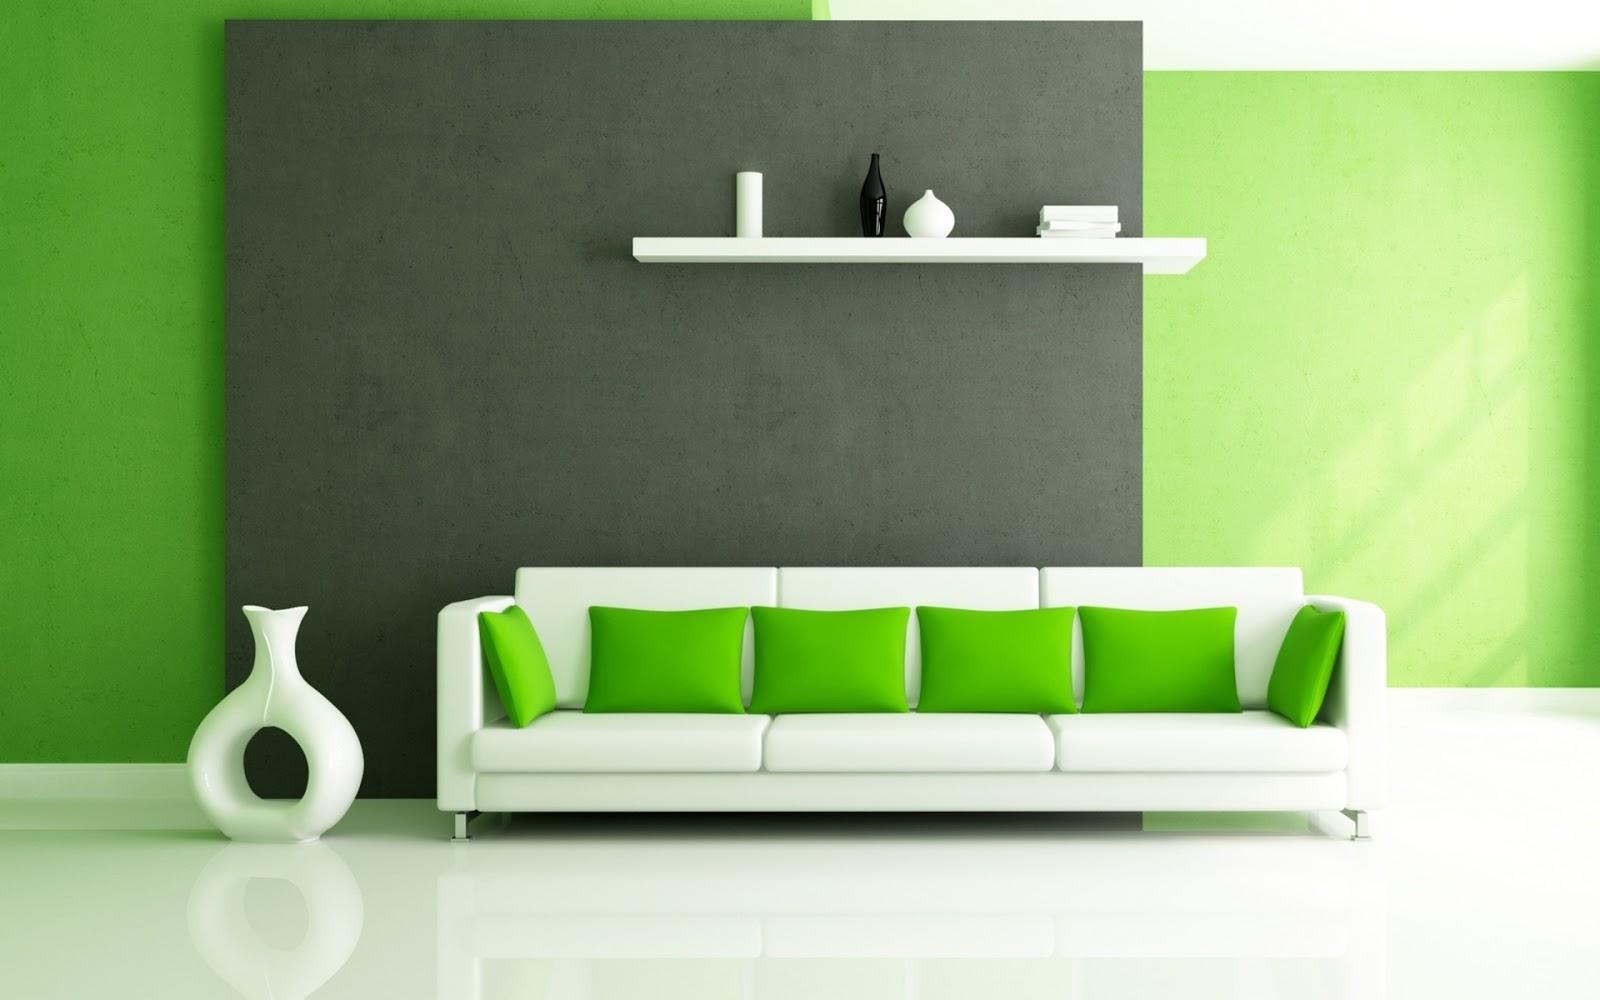 Interior Design Hd Wallpapers Home Interior Design Hd 1600x1000 Download Hd Wallpaper Wallpapertip